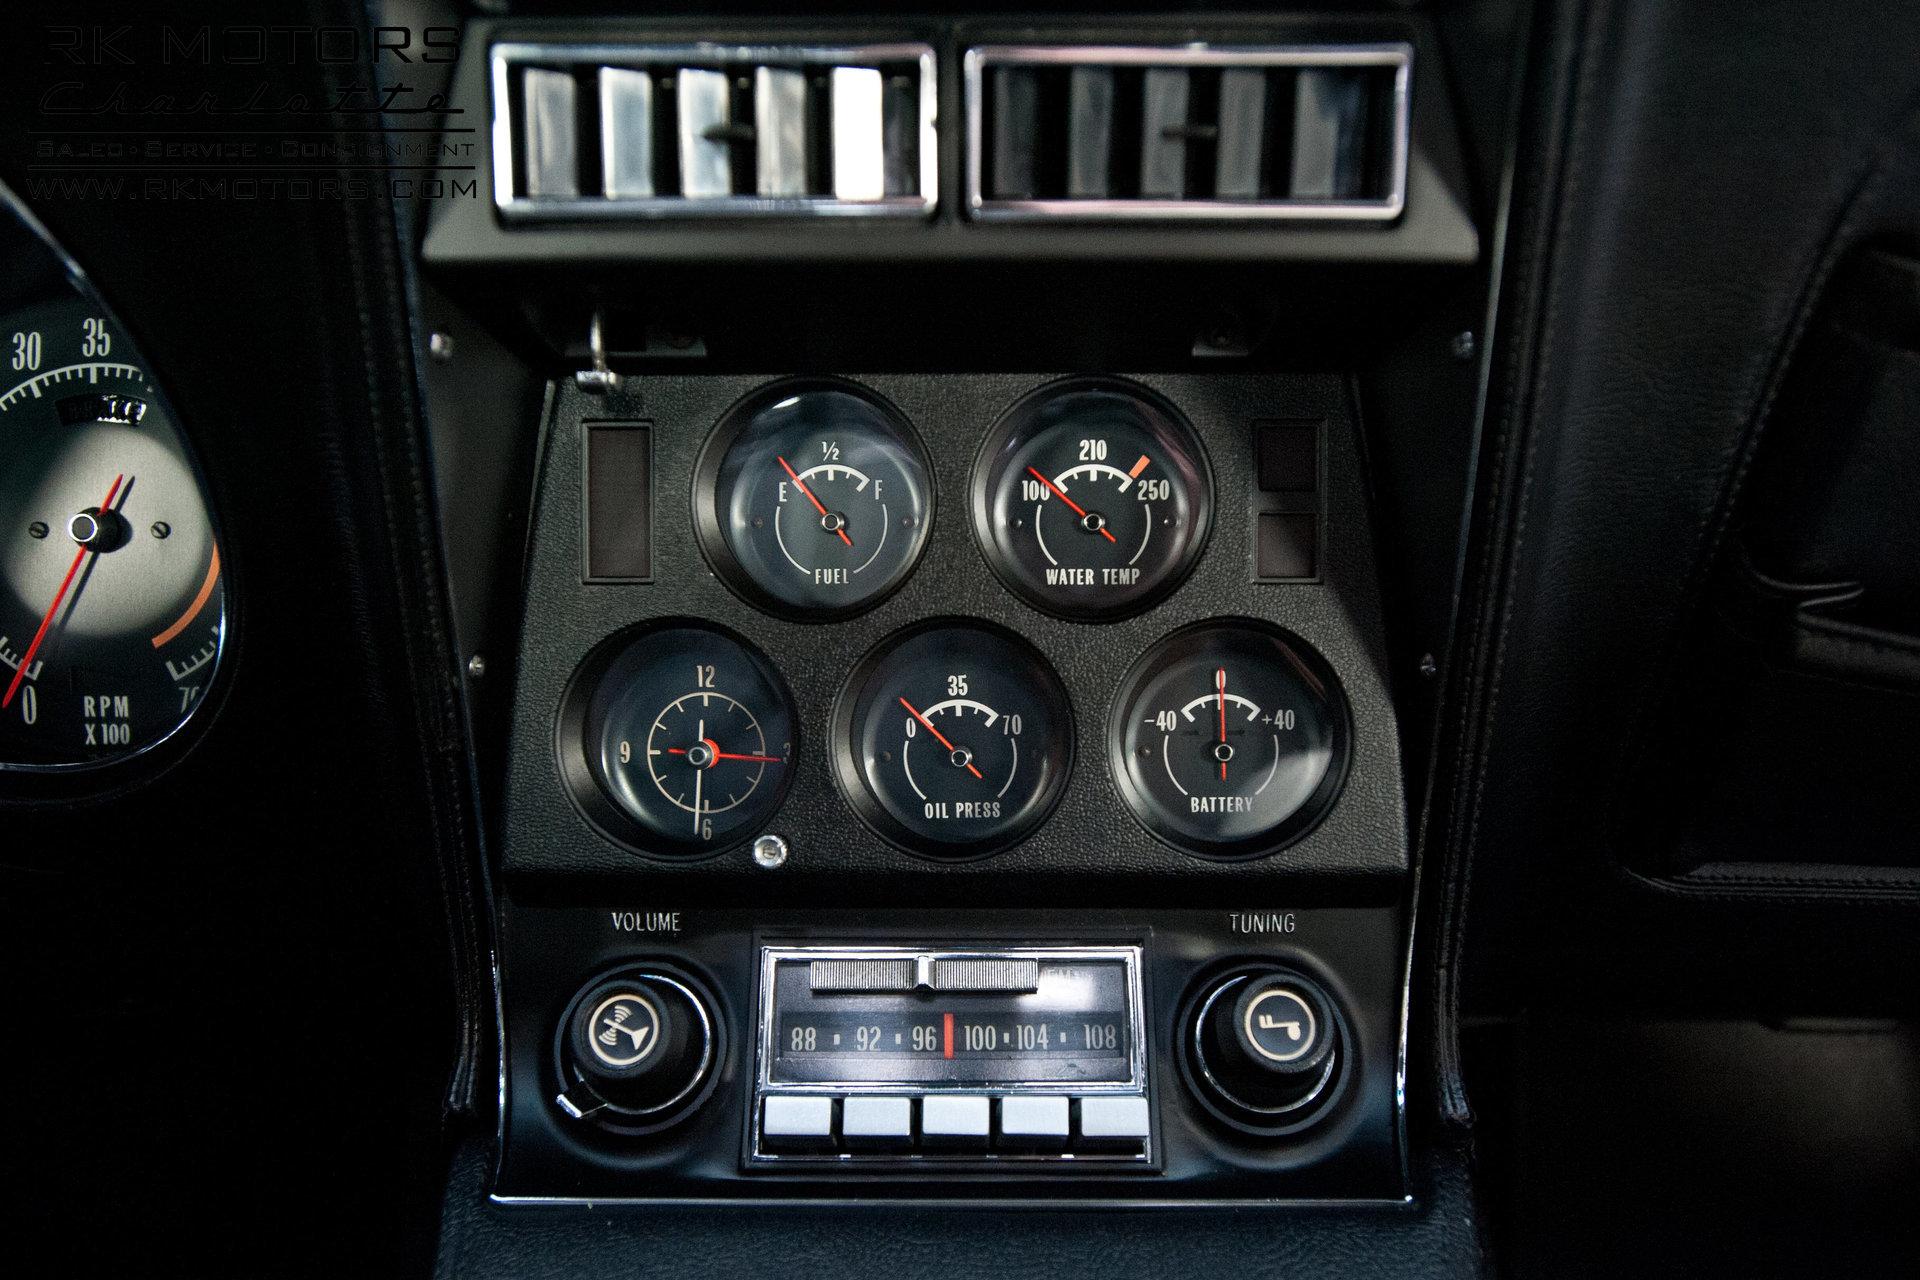 134168 1972 Chevrolet Corvette Rk Motors Classic And Performance Cars For Sale